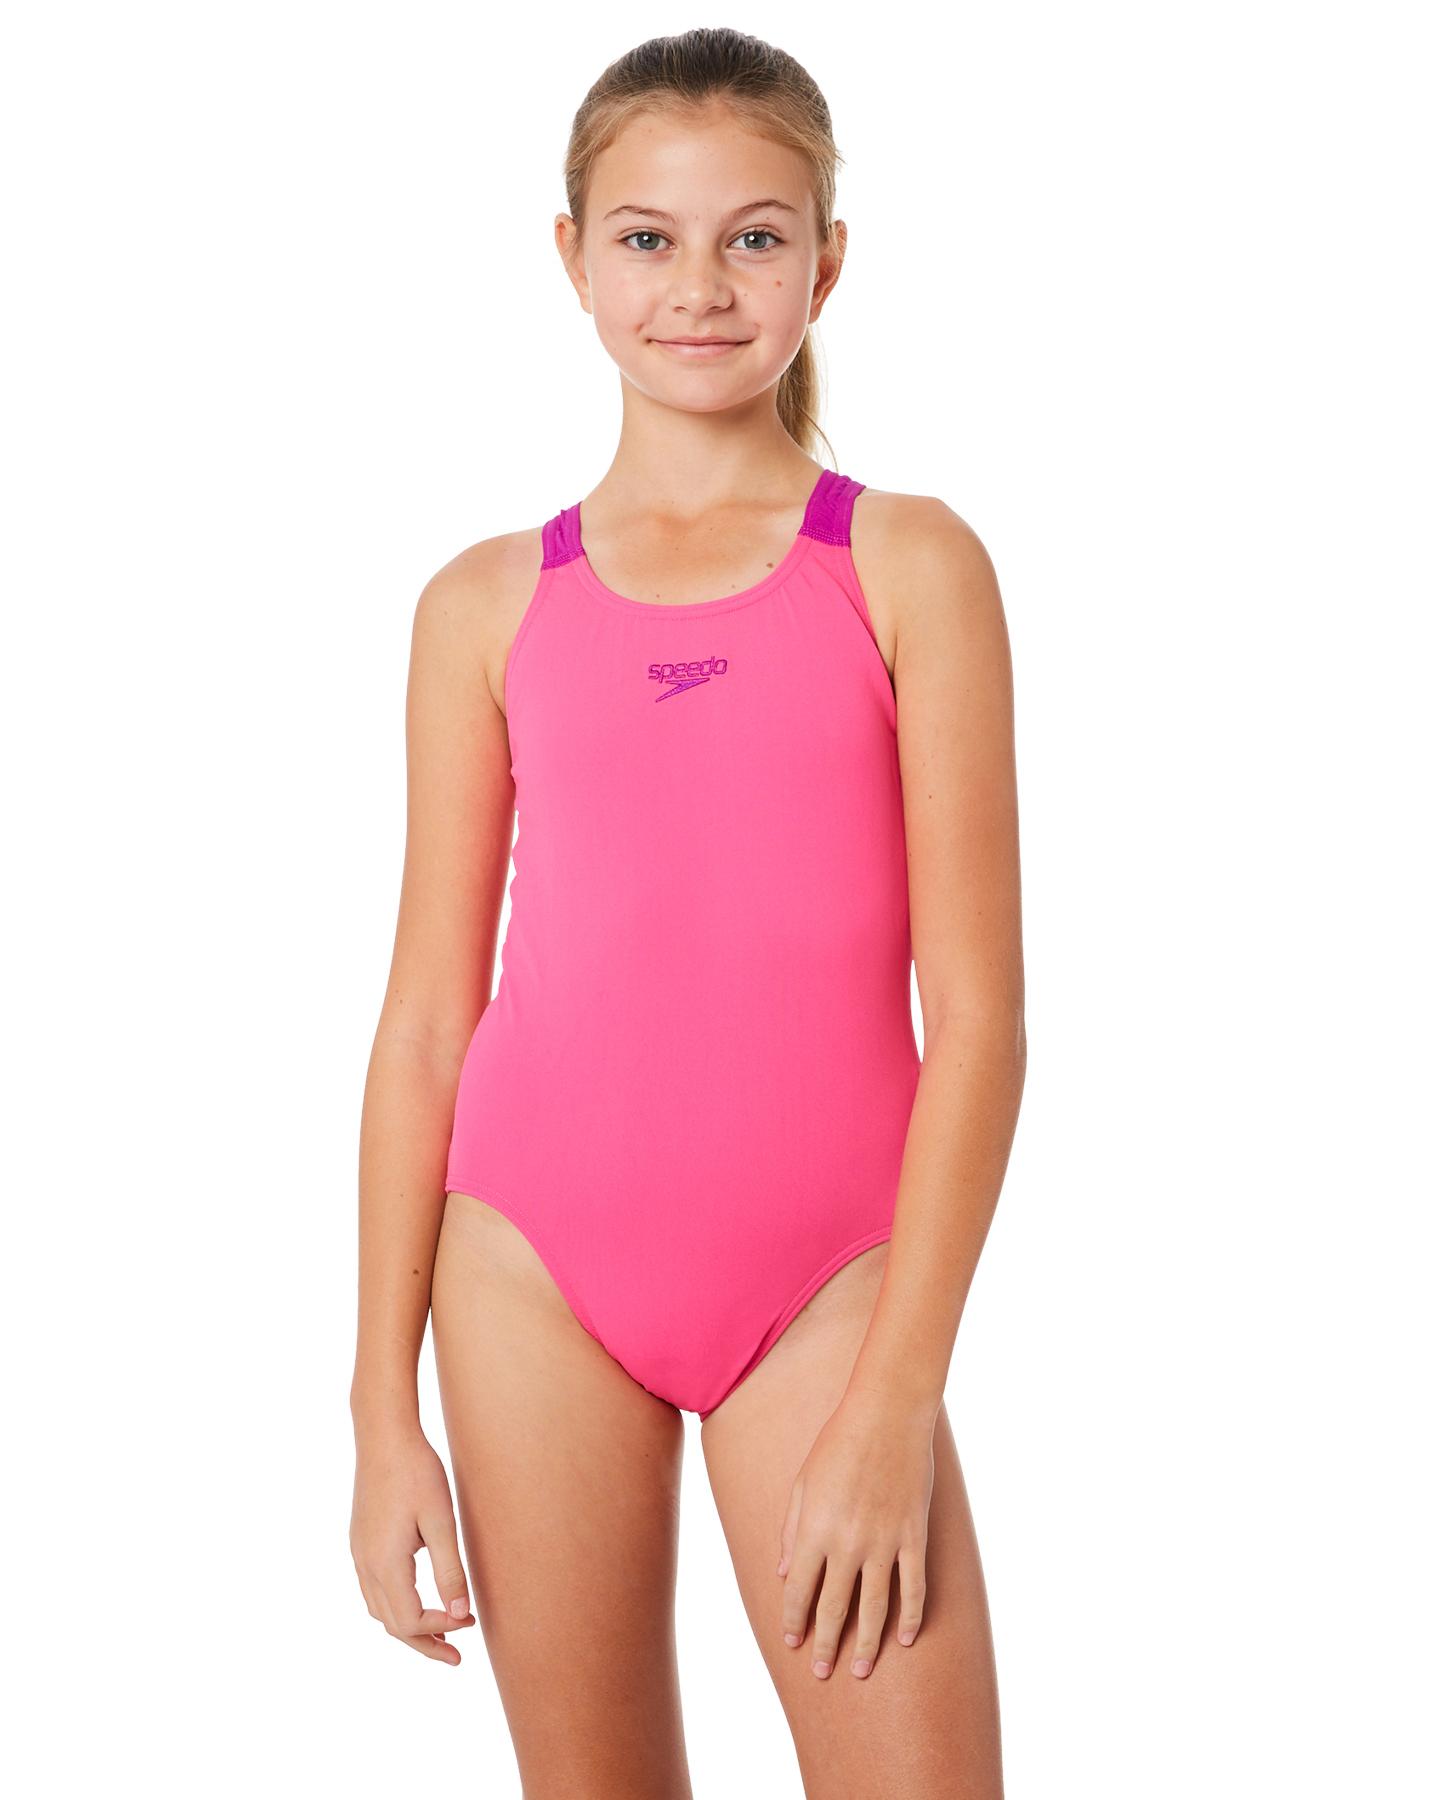 Recommend girl swimsuit speedo swimwear the